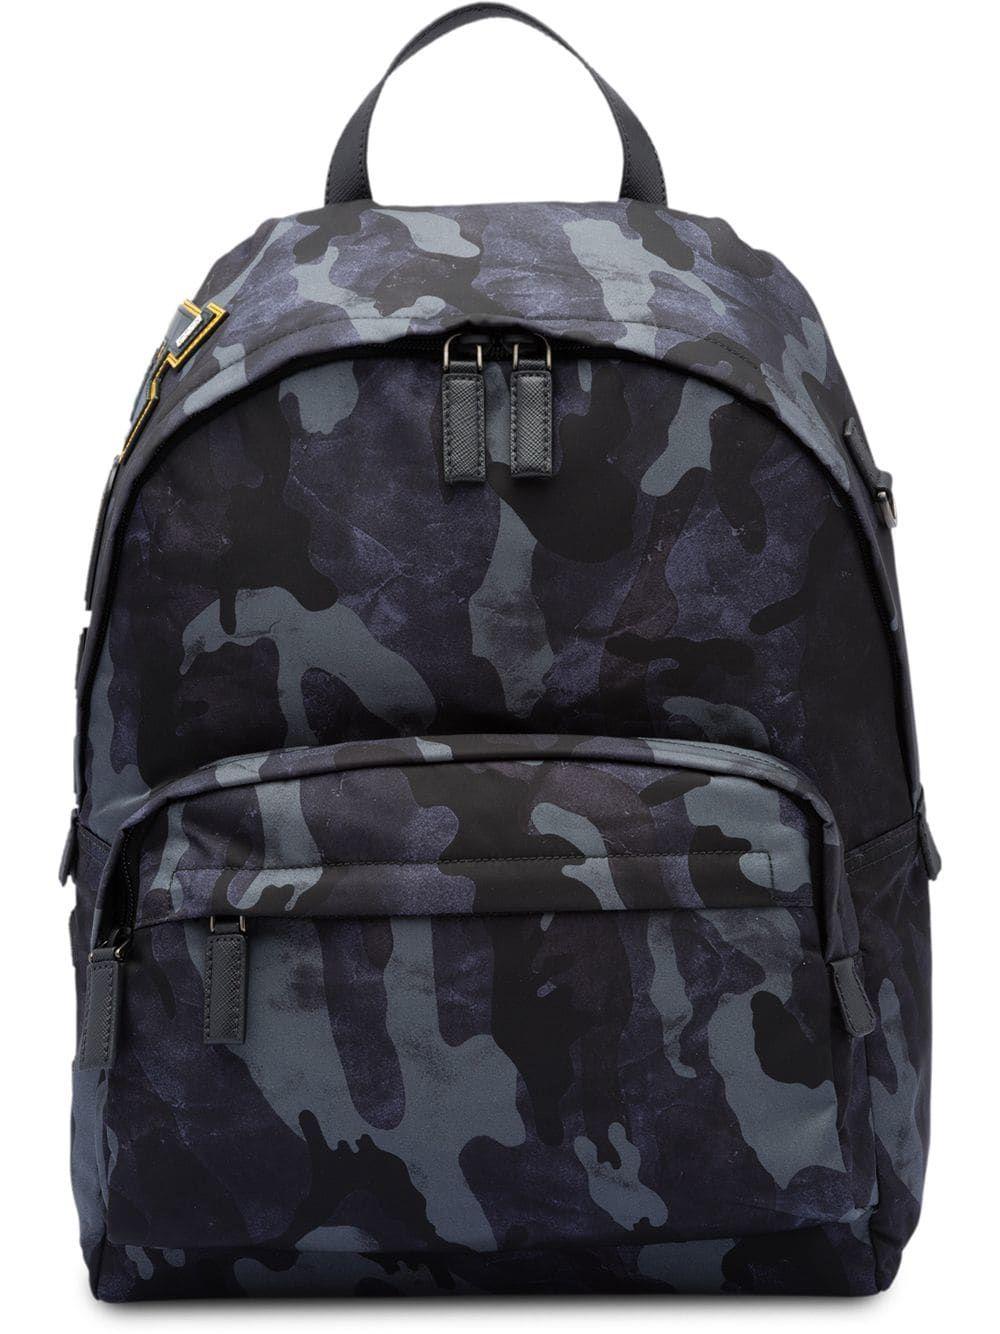 b026af278fcb2b PRADA PRADA CAMOUFLAGE PRINT BACKPACK - BLUE. #prada #bags #backpacks